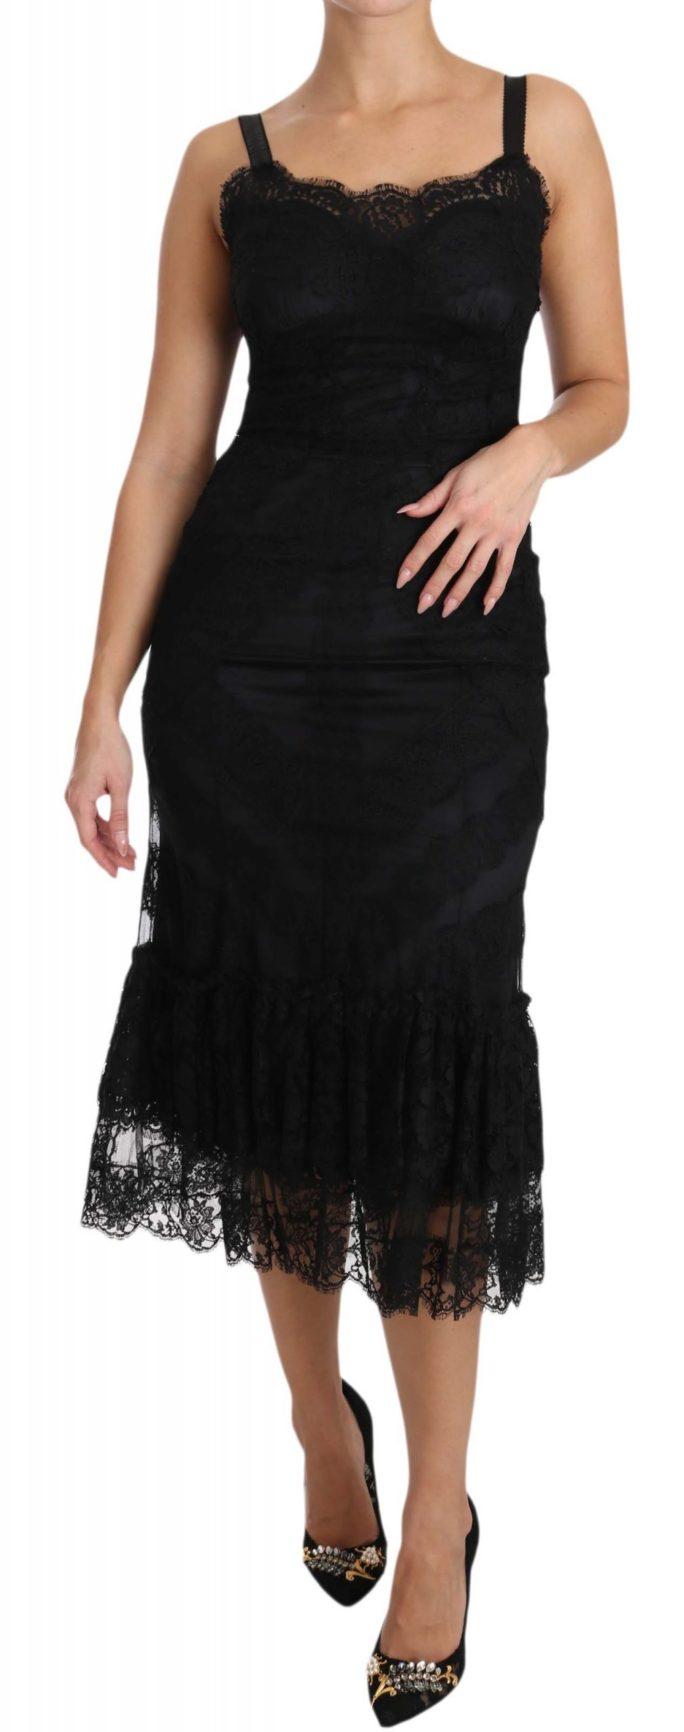 638540 Black Floral Lace Shift Gown Dress.jpg